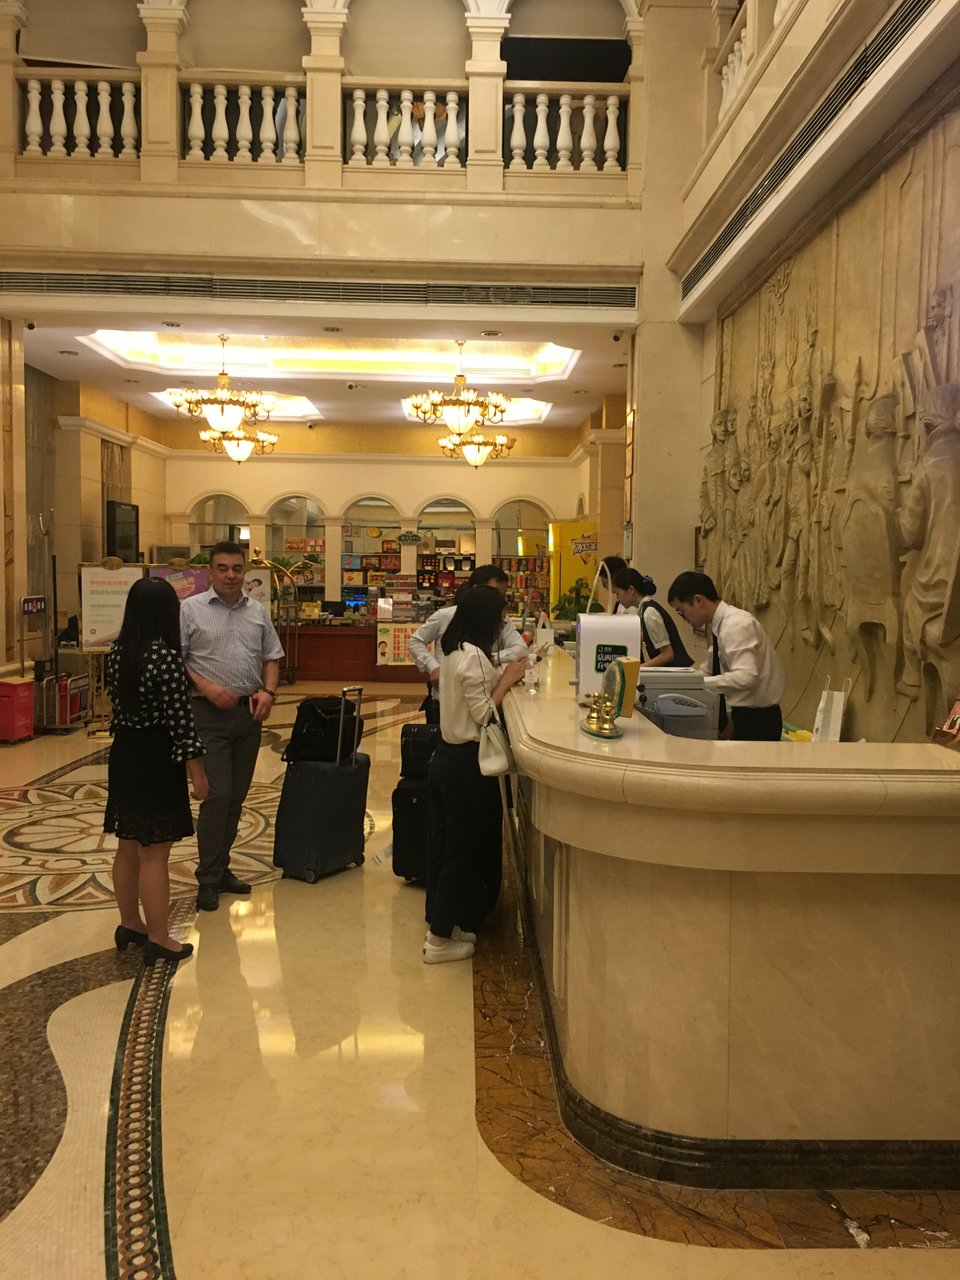 vienna hotel shenzhen international 46 5 3 updated 2019 rh tripadvisor com